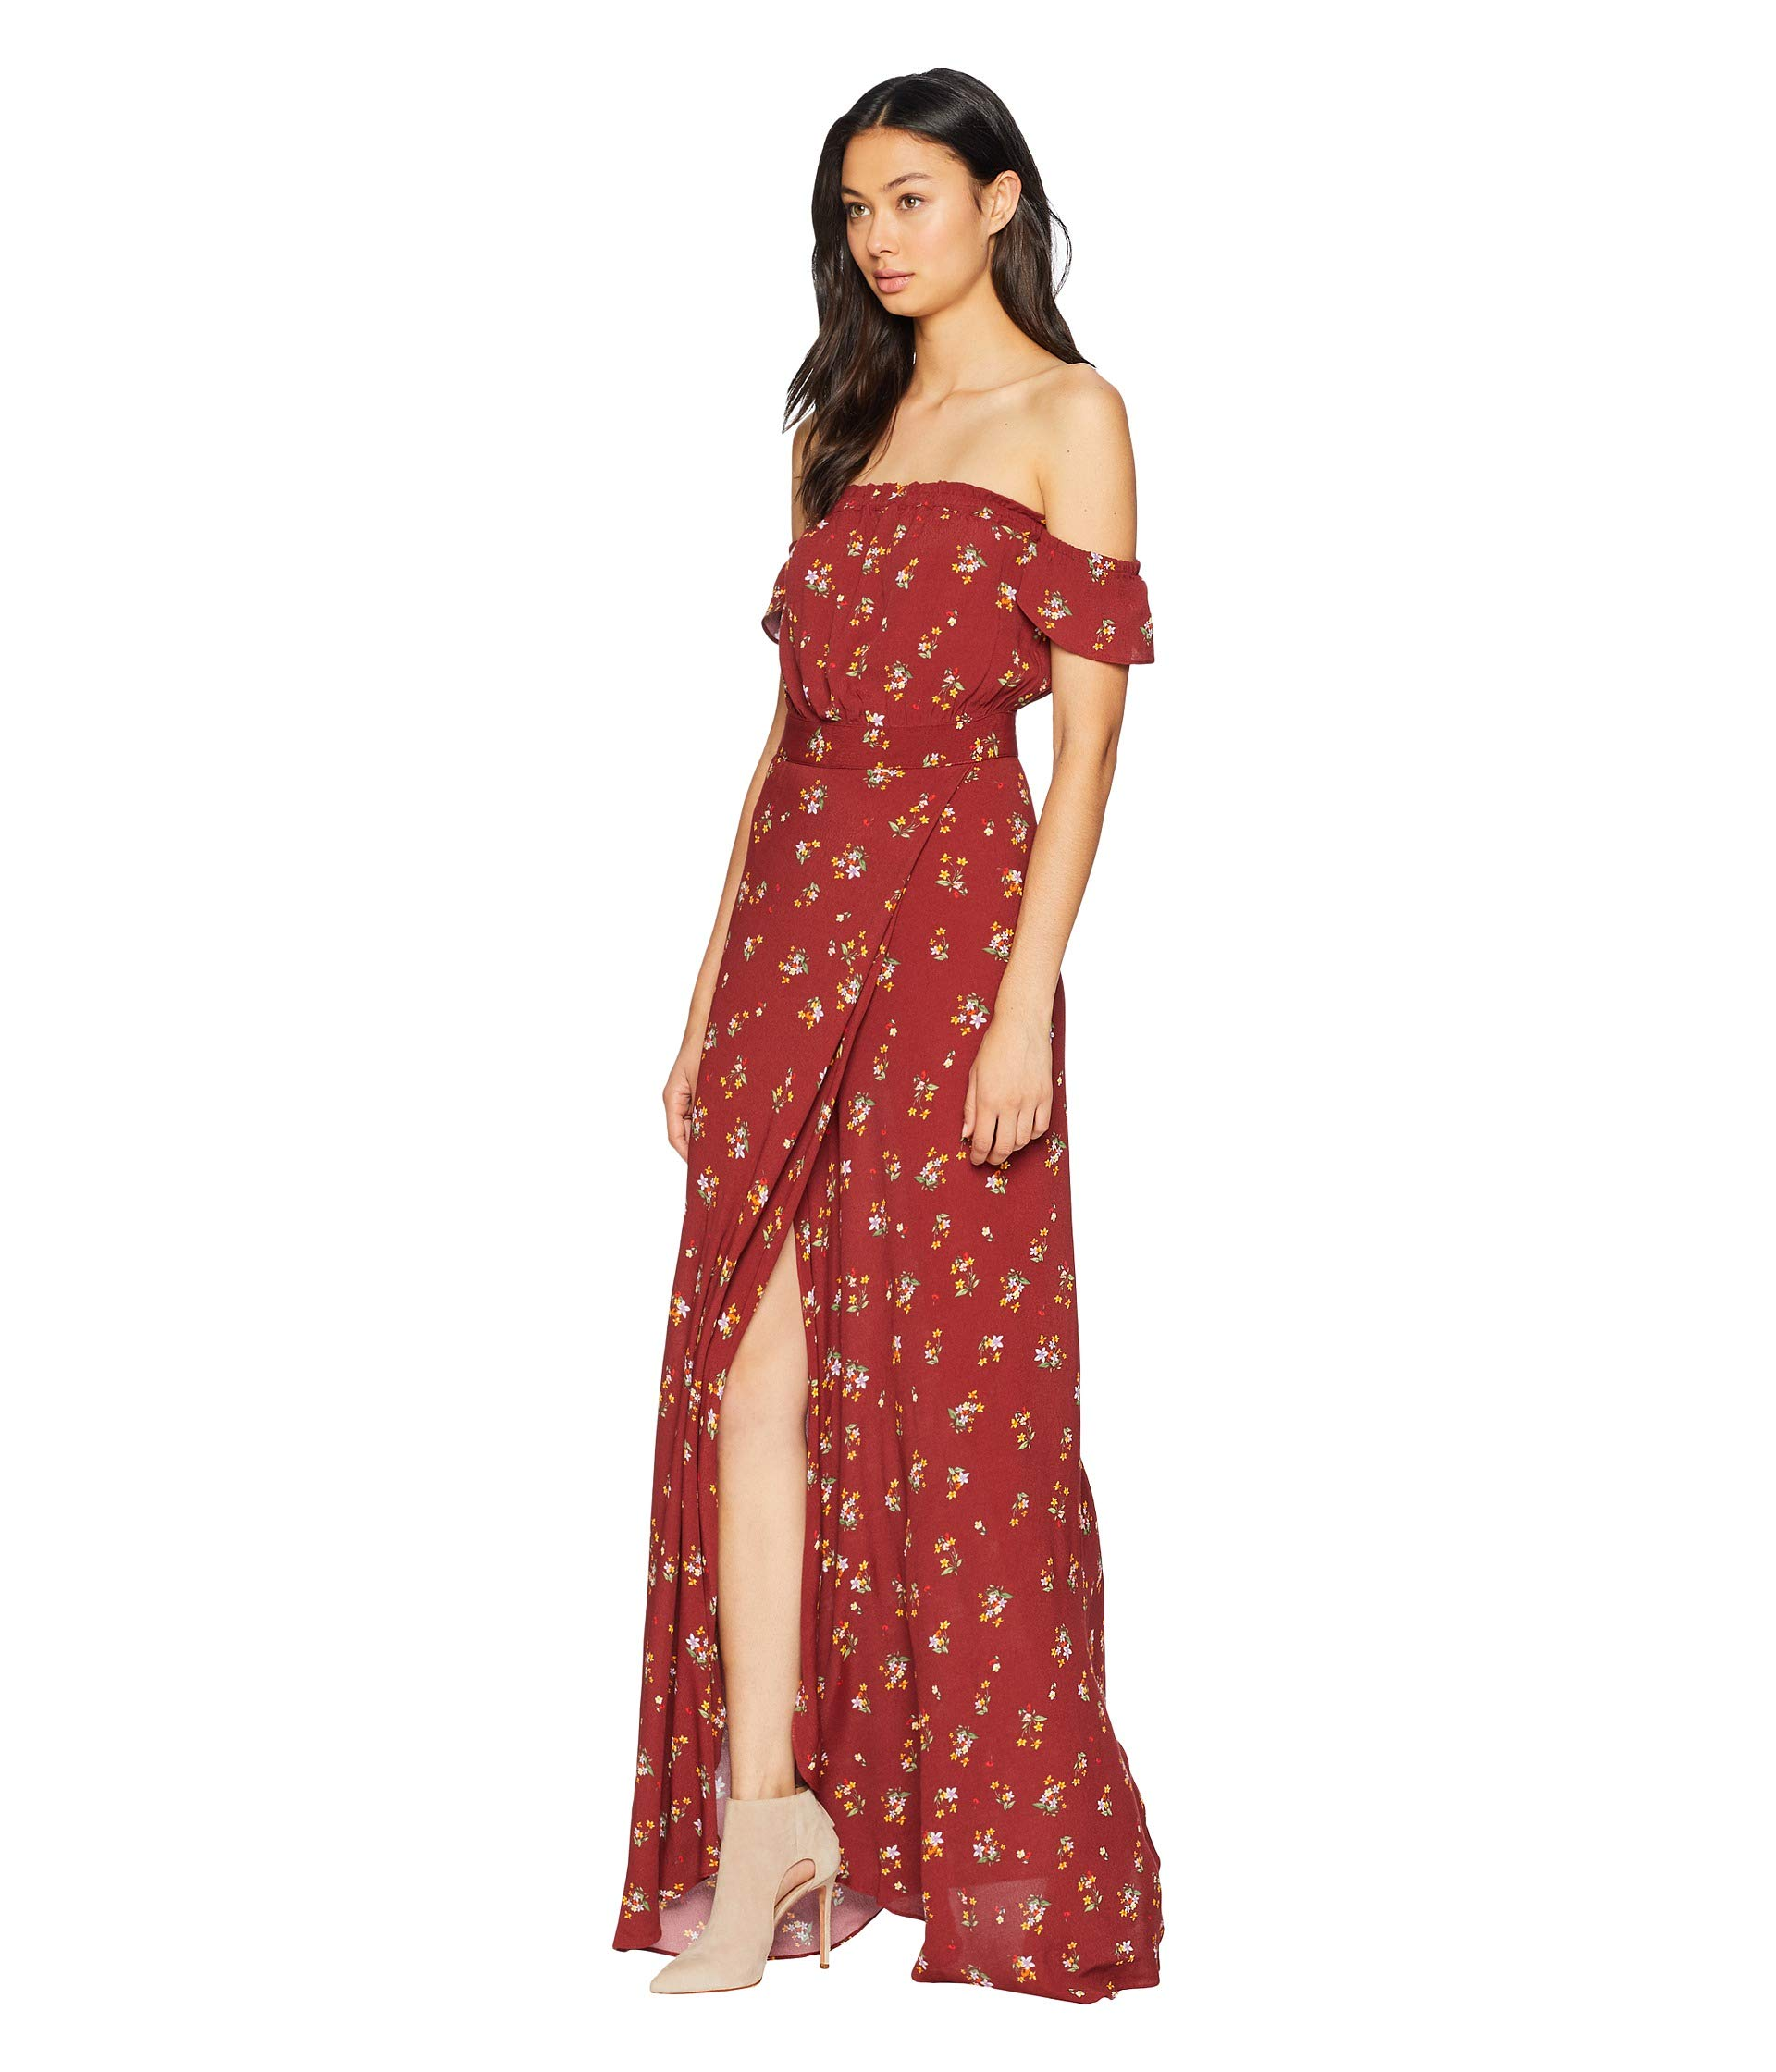 Autumn Flynn Bunches Dress Maxi Skye Bella ASB4S8T